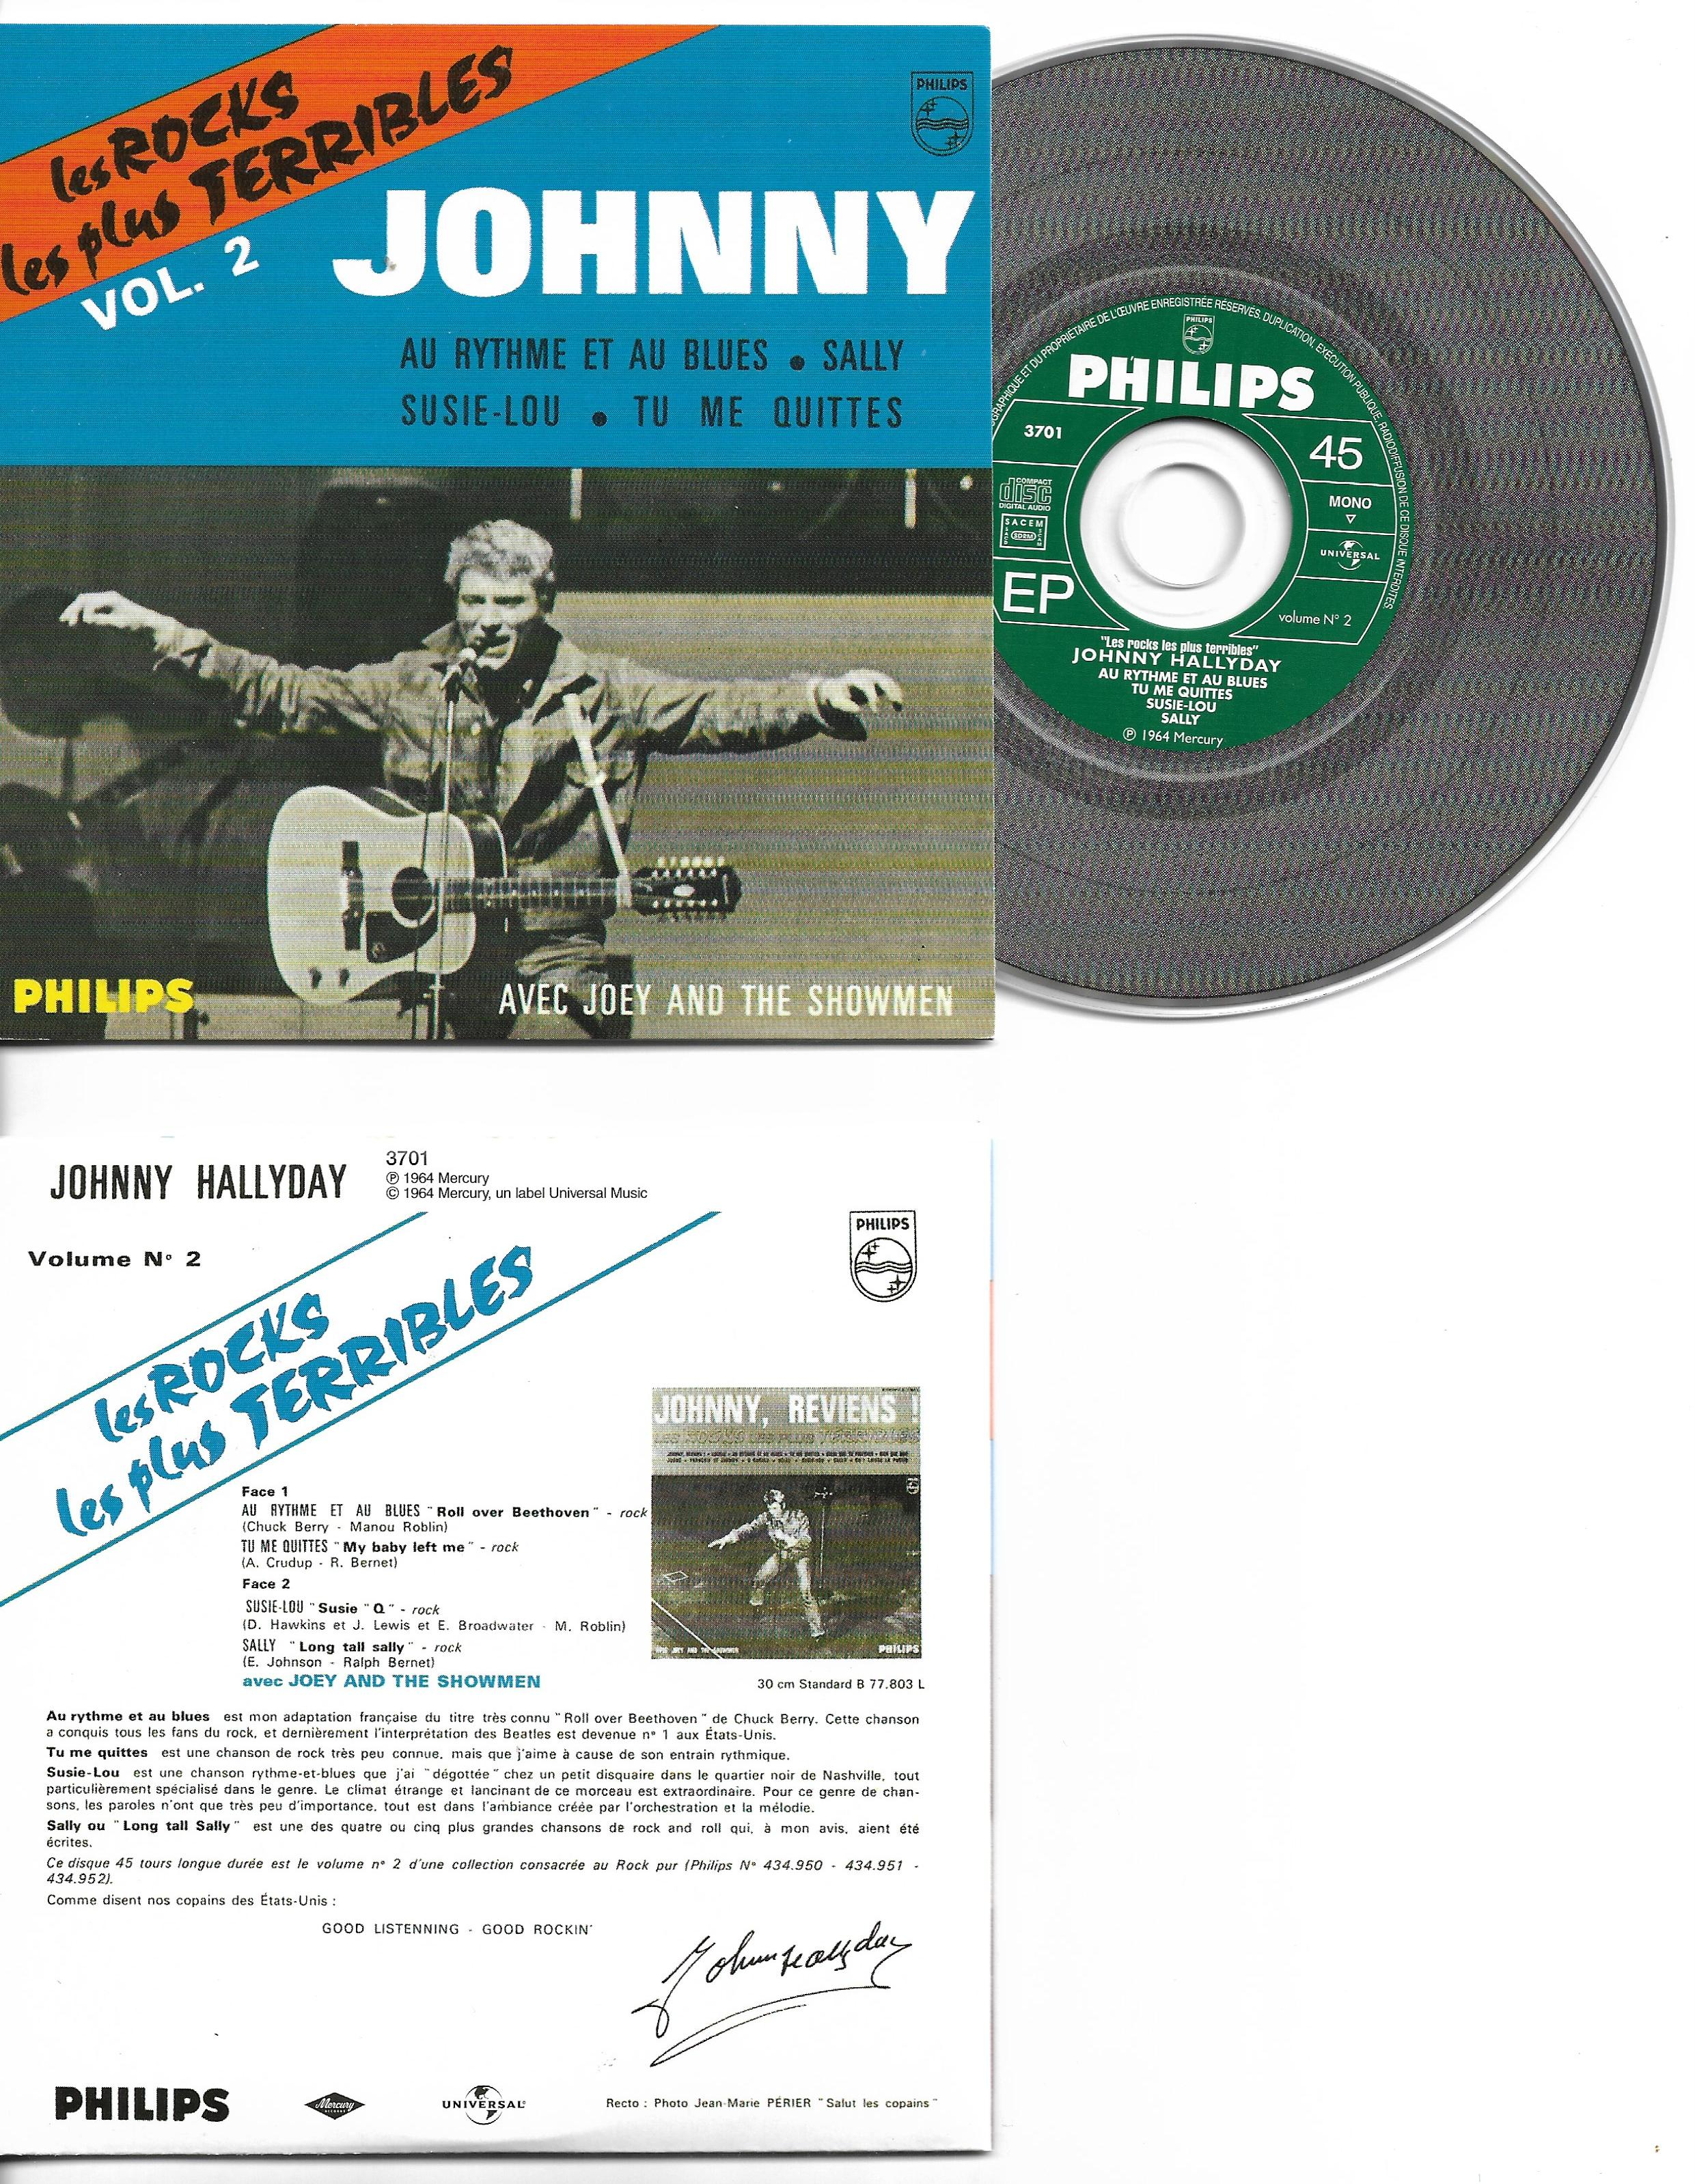 JOHNNY HALLYDAY - Les rocks les plus terribles vol 2 4-track CARD SLEEVE EP REPLICA - CD single